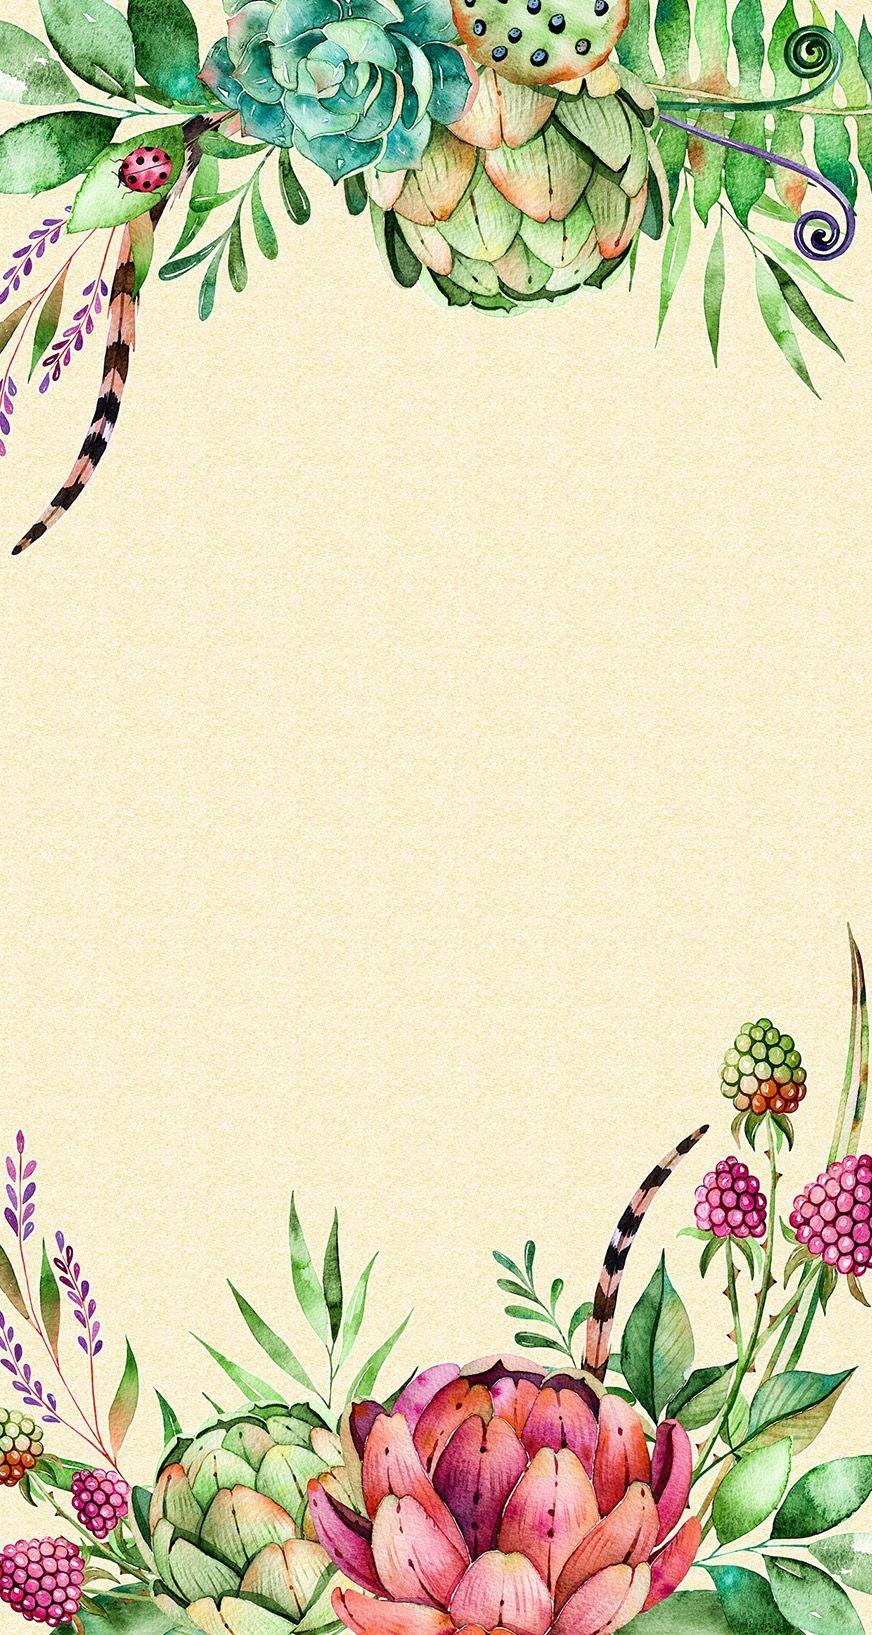 Pin by Ekta Das on Illustration Flowery wallpaper